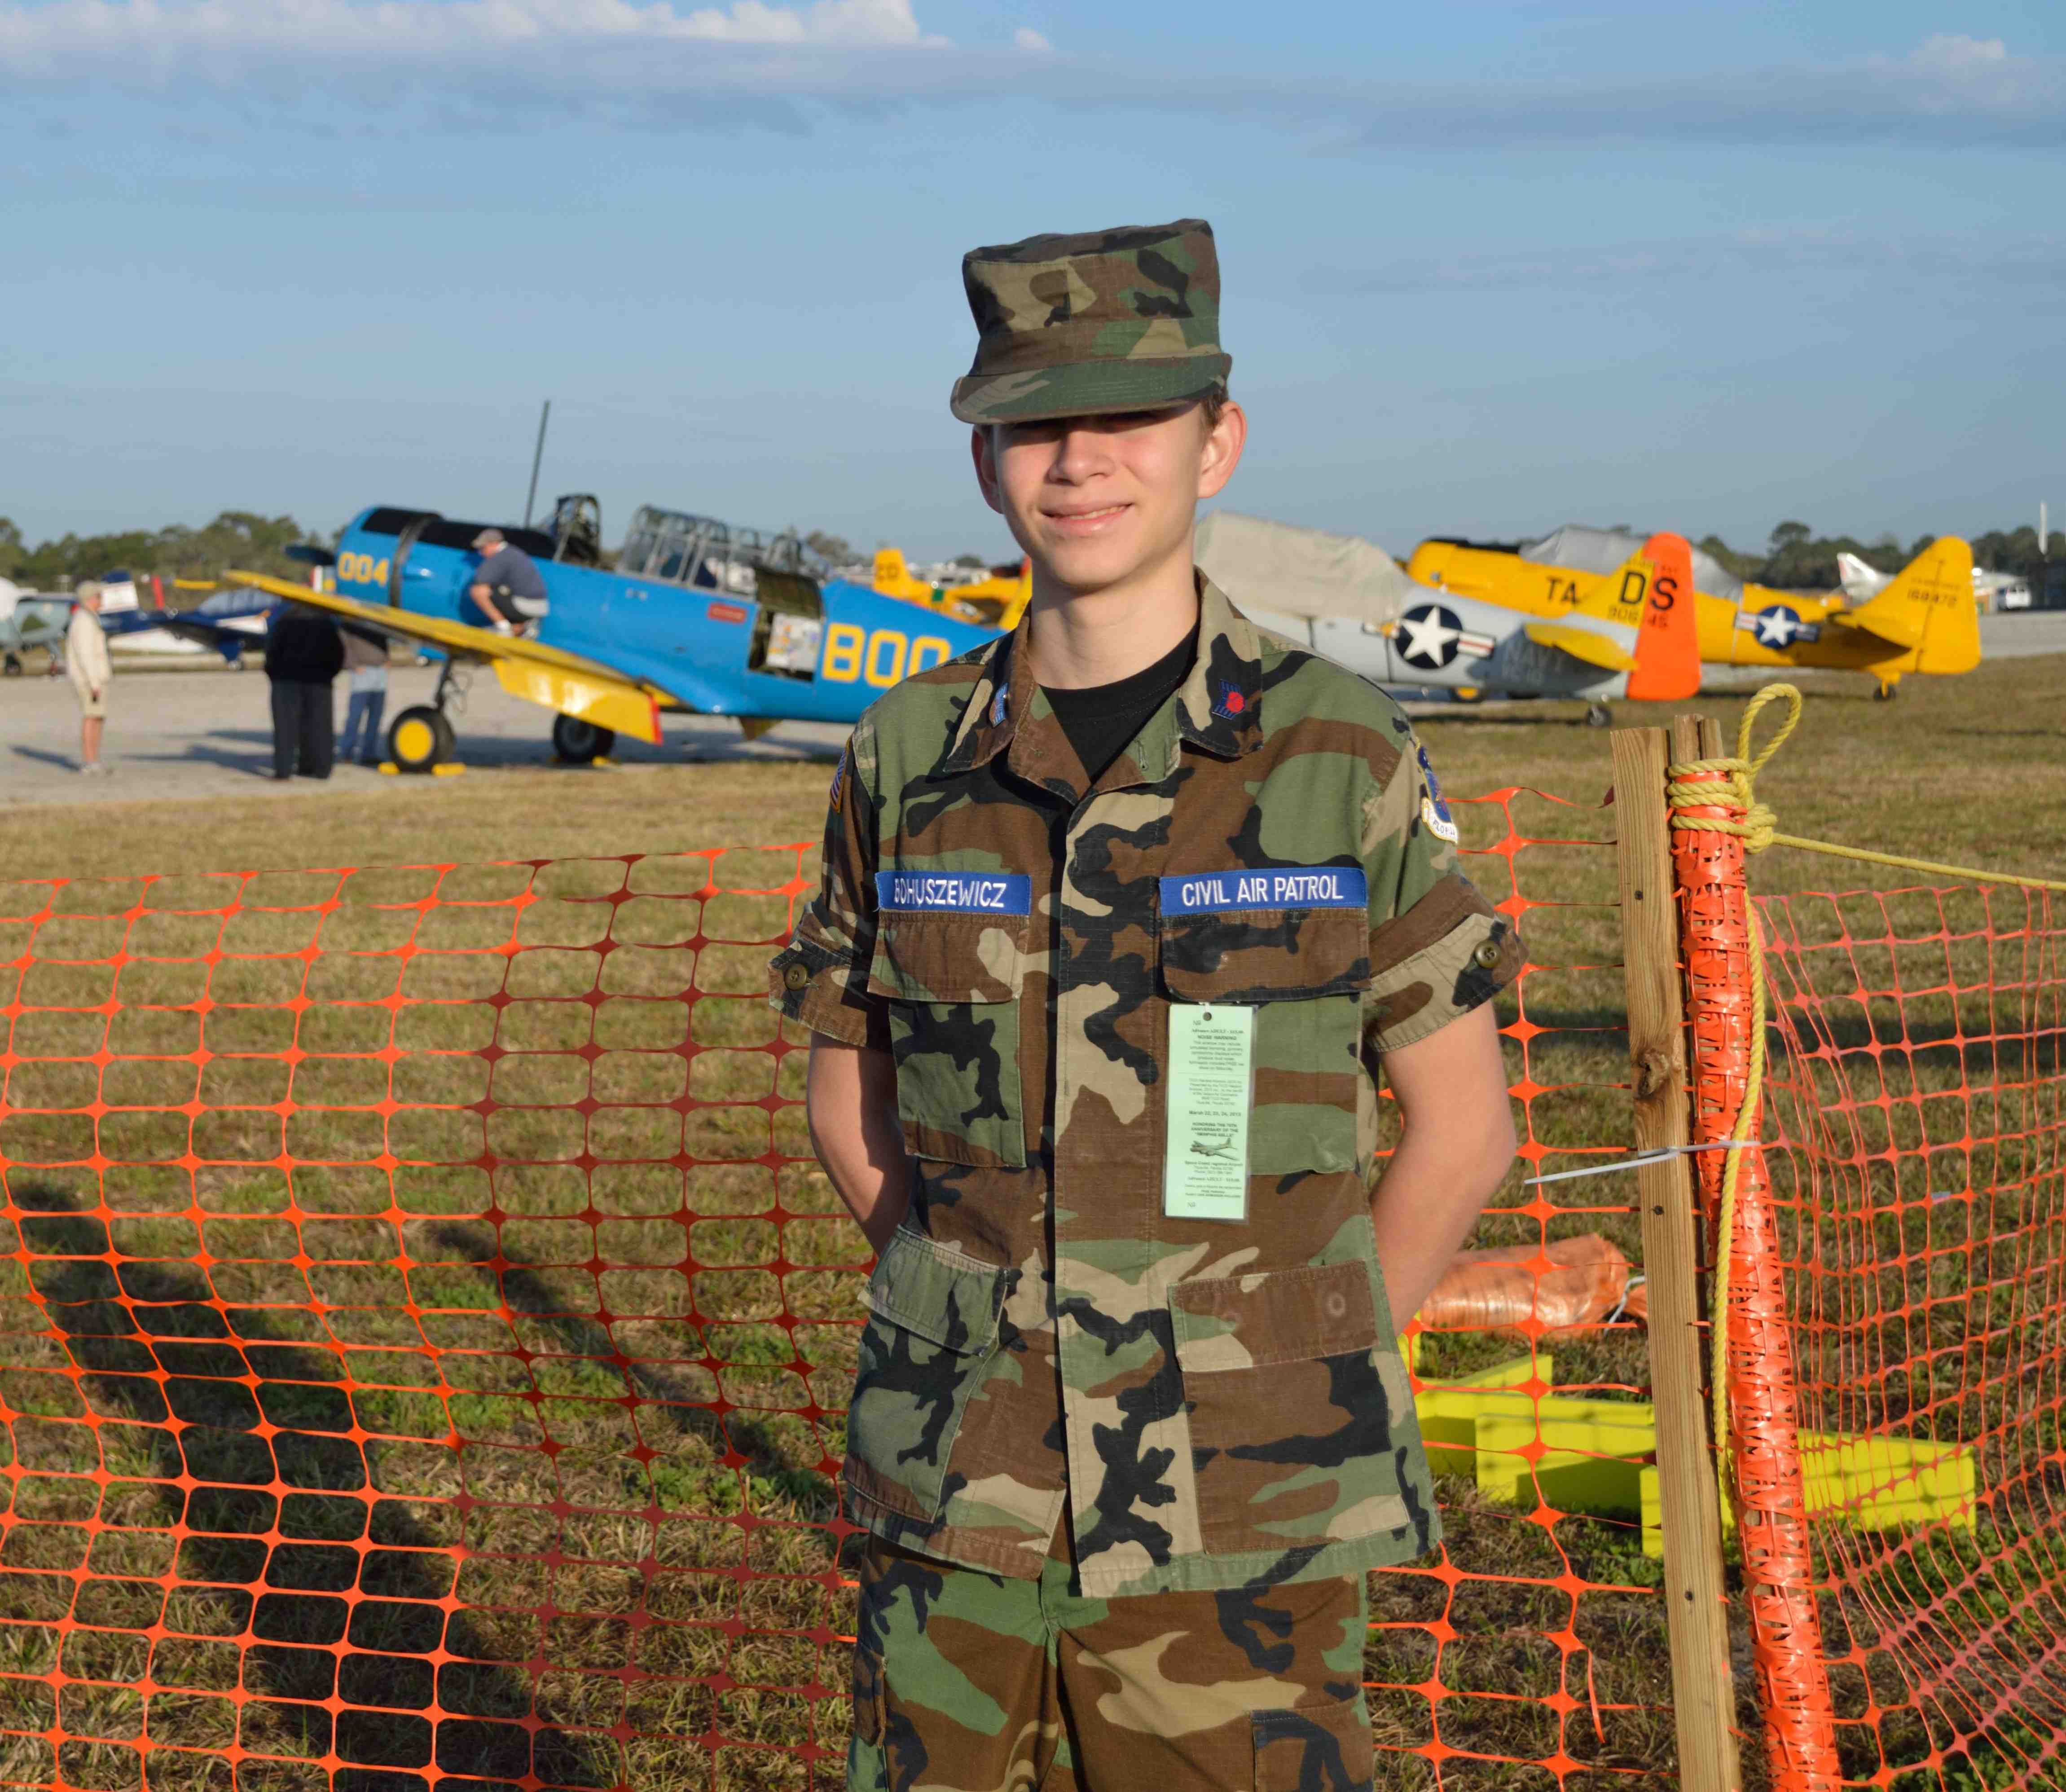 Silvio Bohuszewicz, TICO squadron, securing the VIP and flight line area.